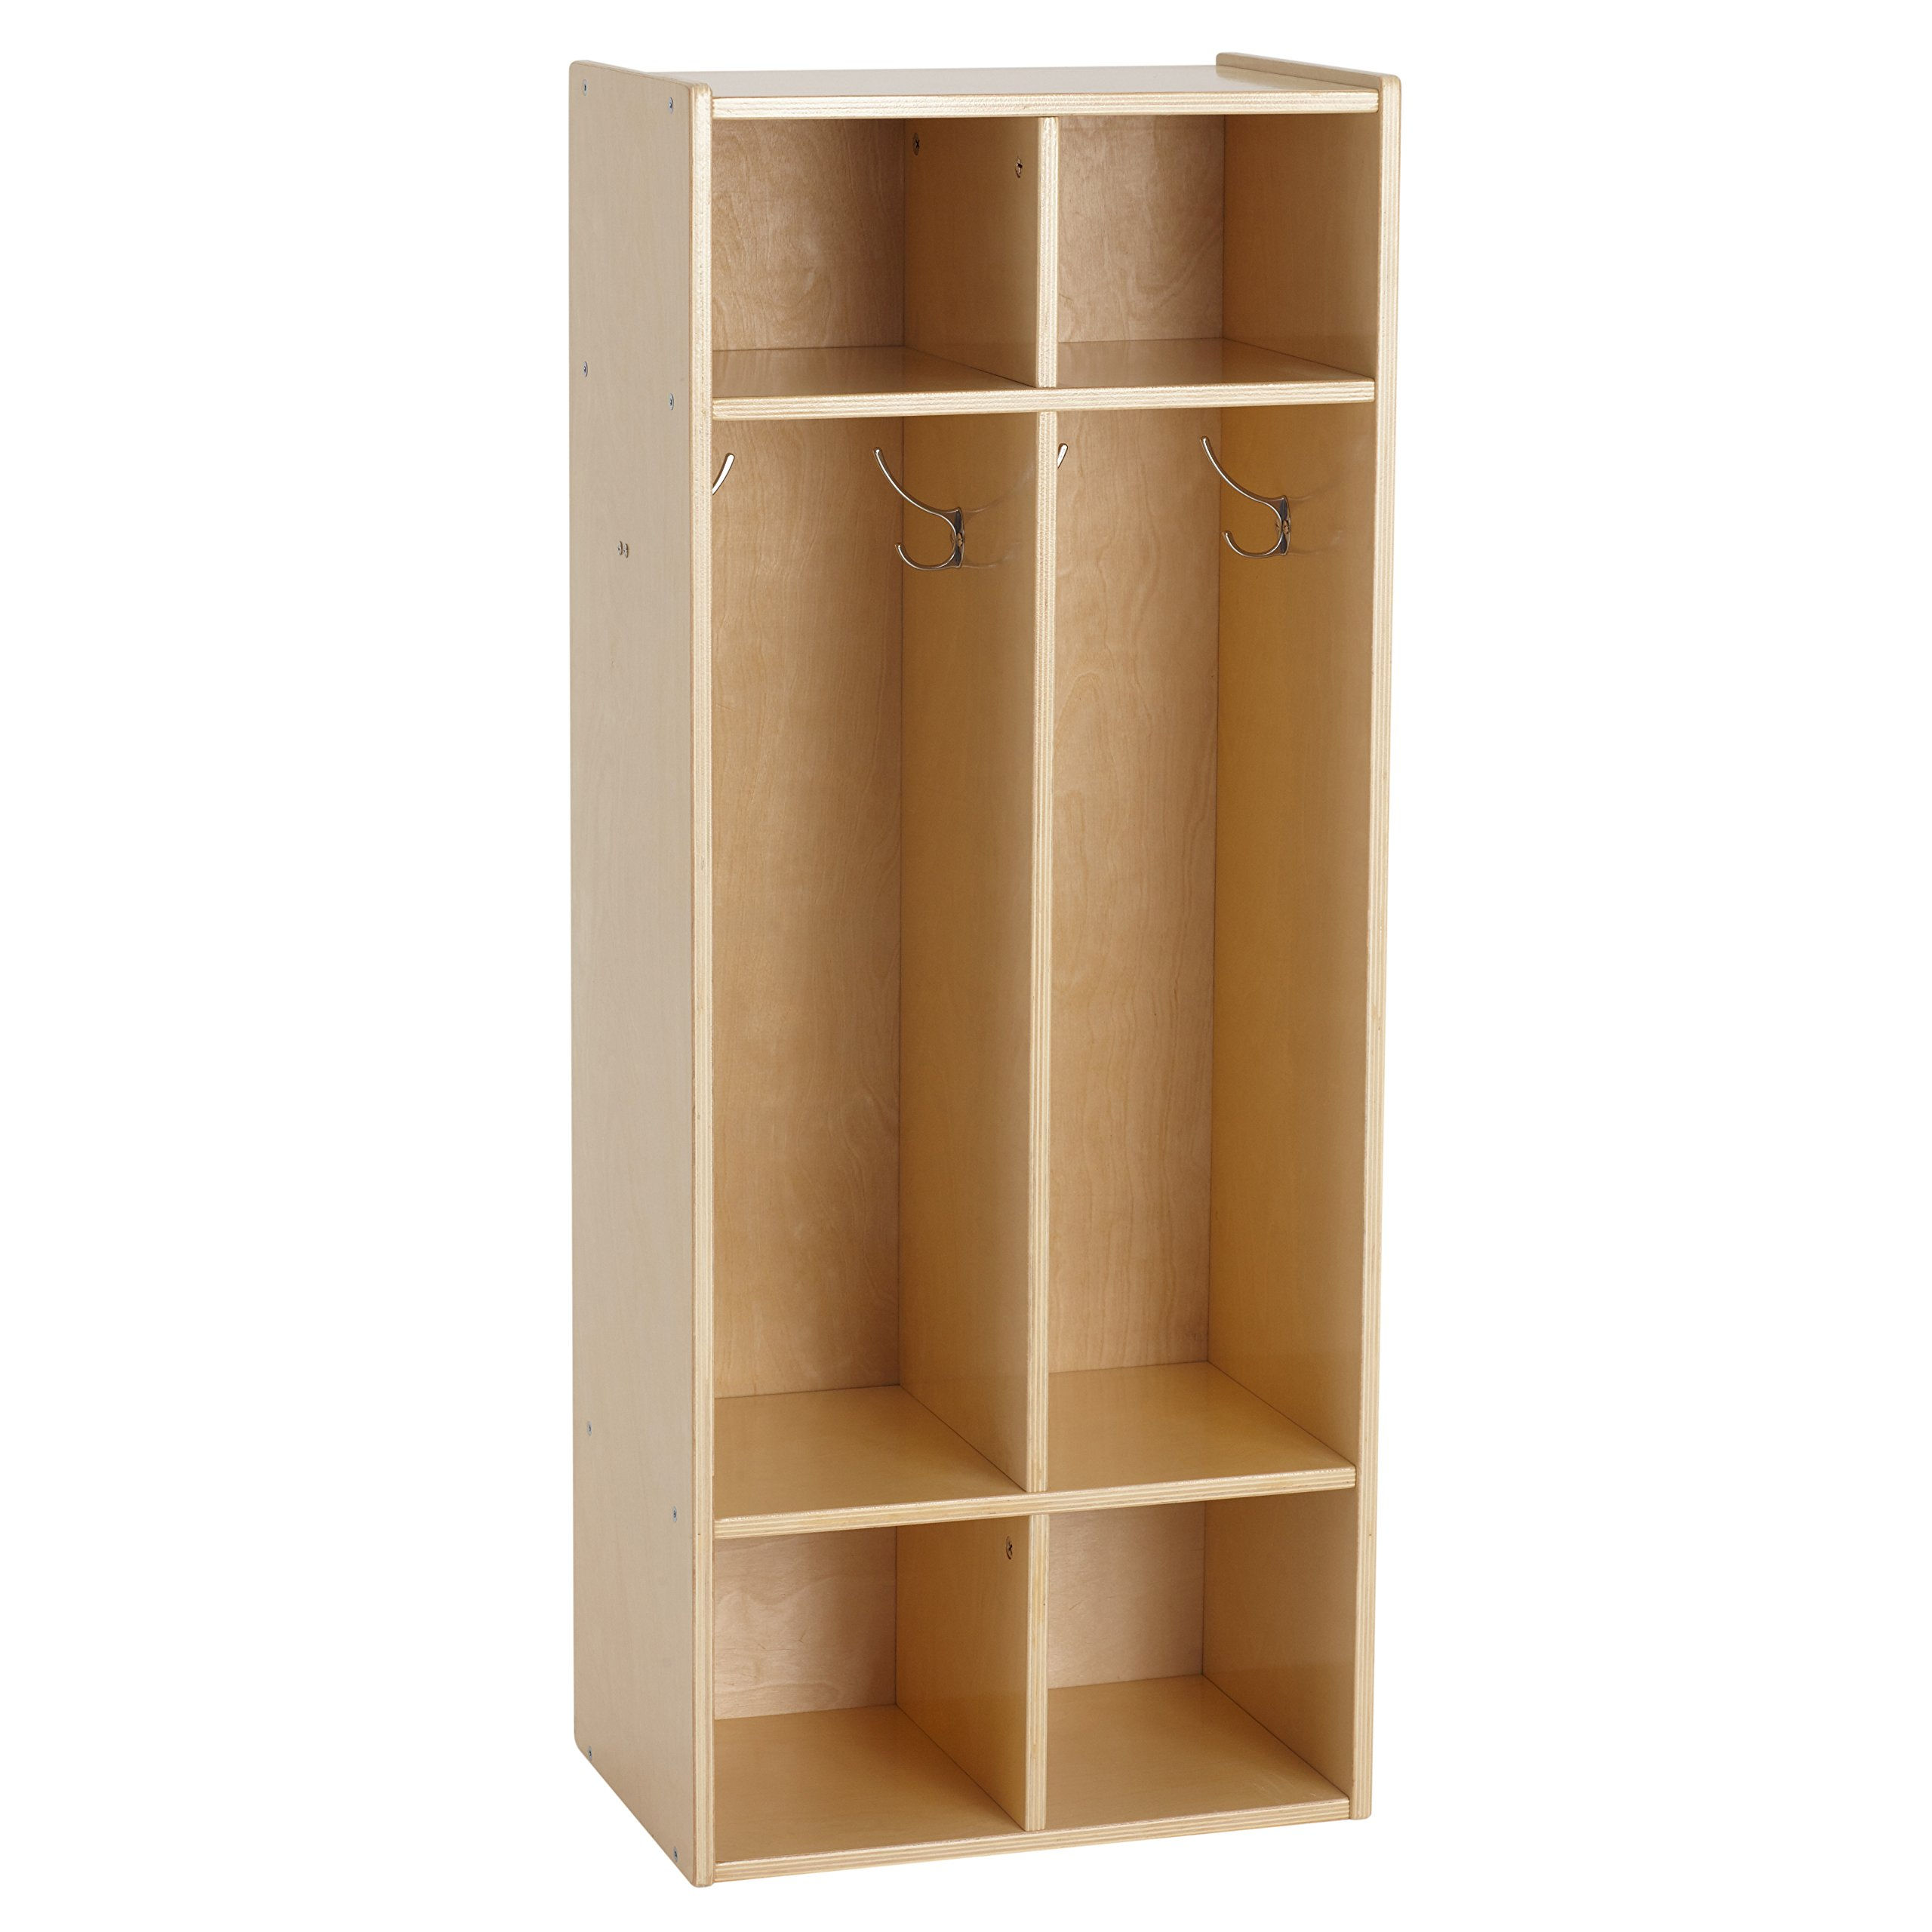 "ECR4Kids Birch Streamline 2-Section Coat Locker, Wood Coat and Backpack Storage for Kids, 45"" Tall - Natural"